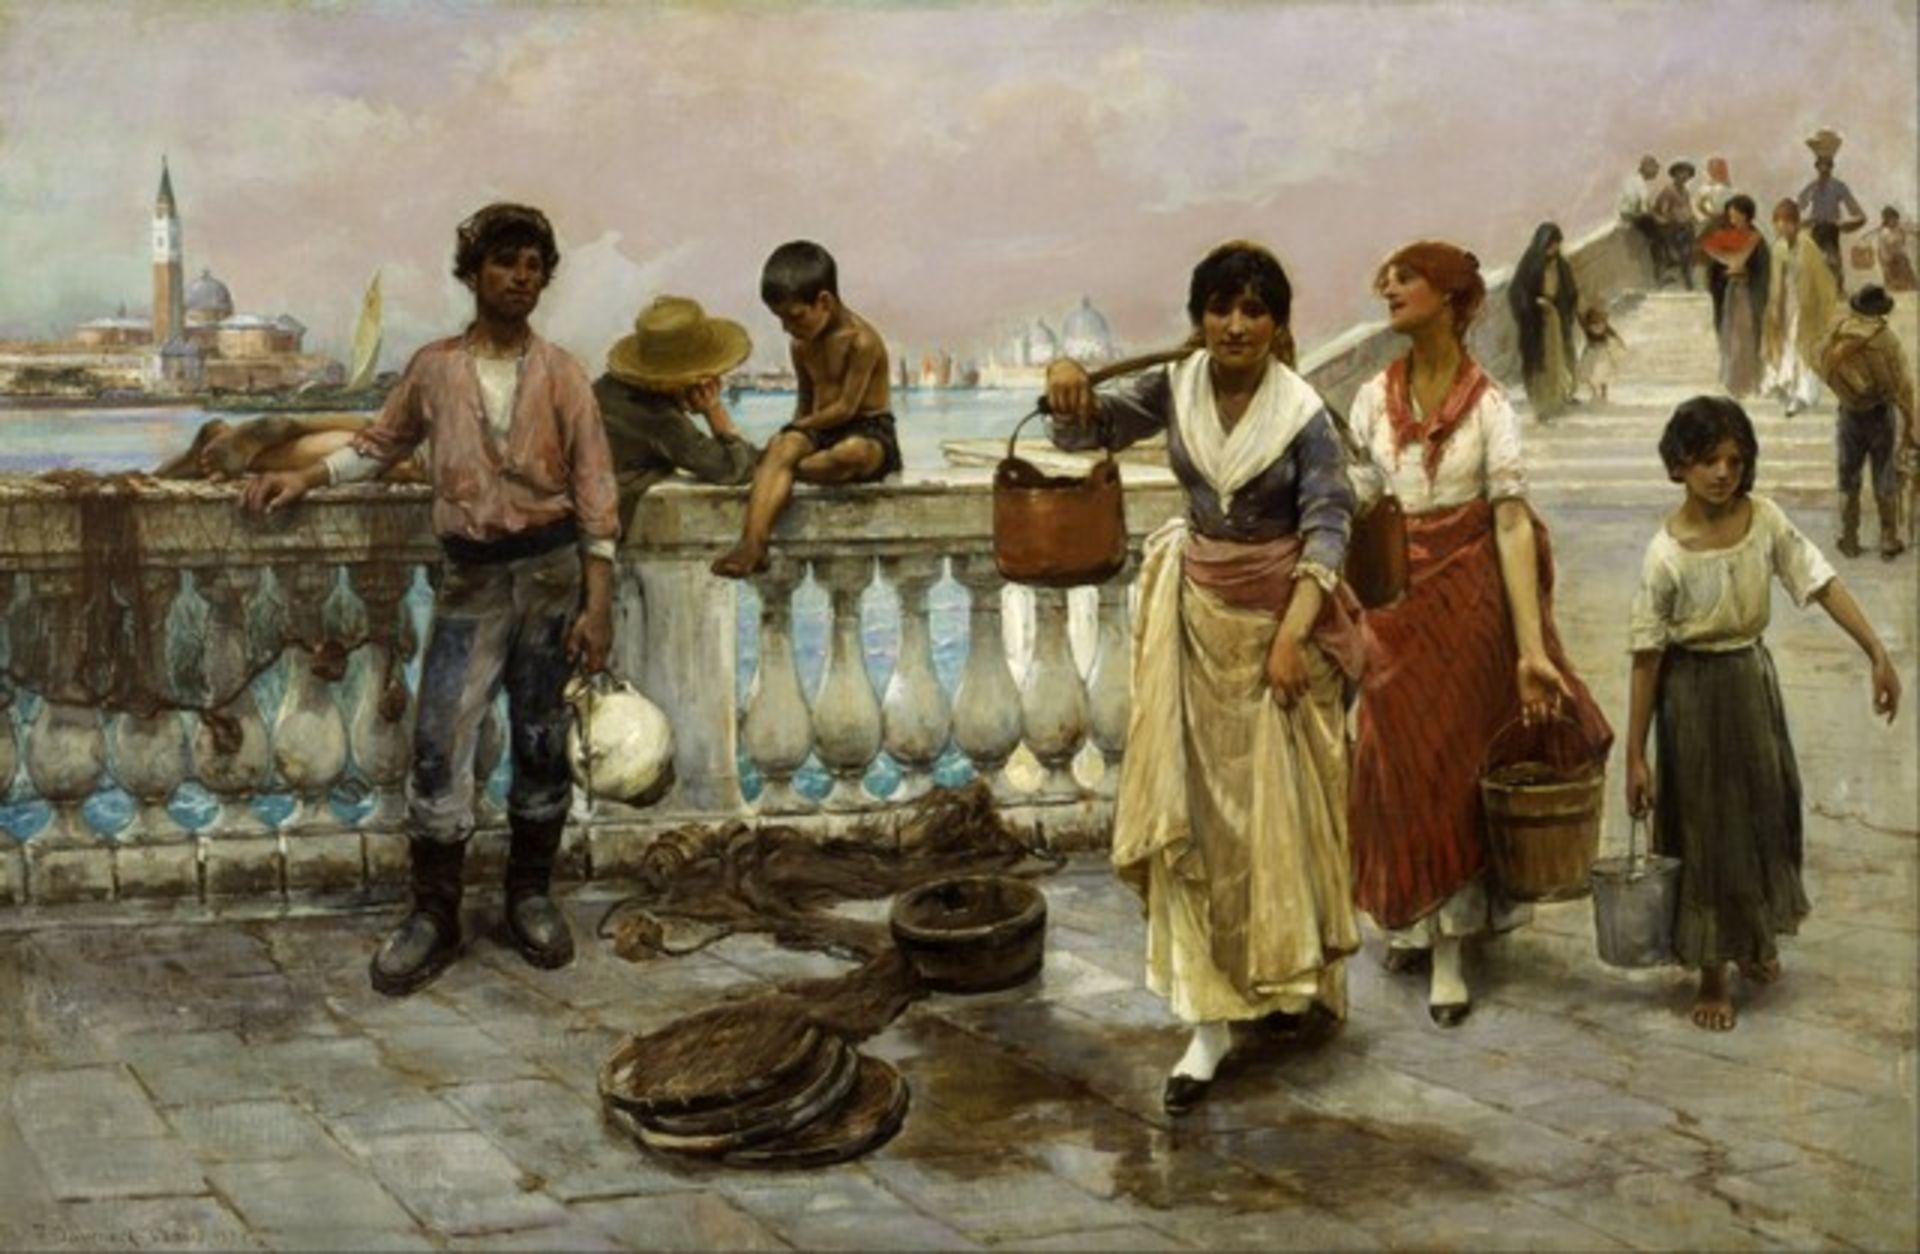 Frank Duveneck - Water Carriers, Venice - Image 2 of 2